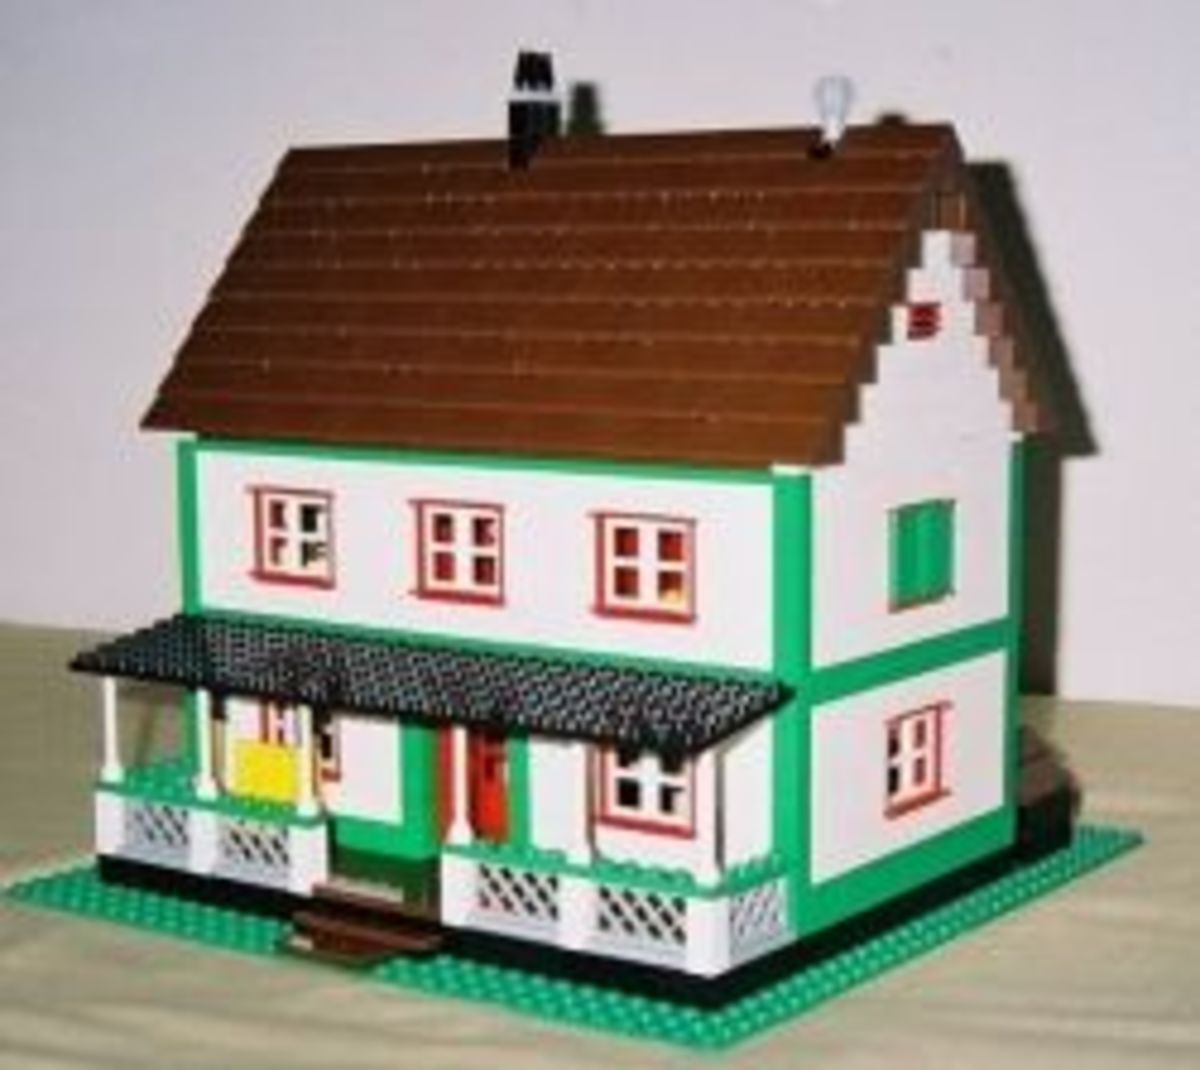 LEGO model of farmhouse